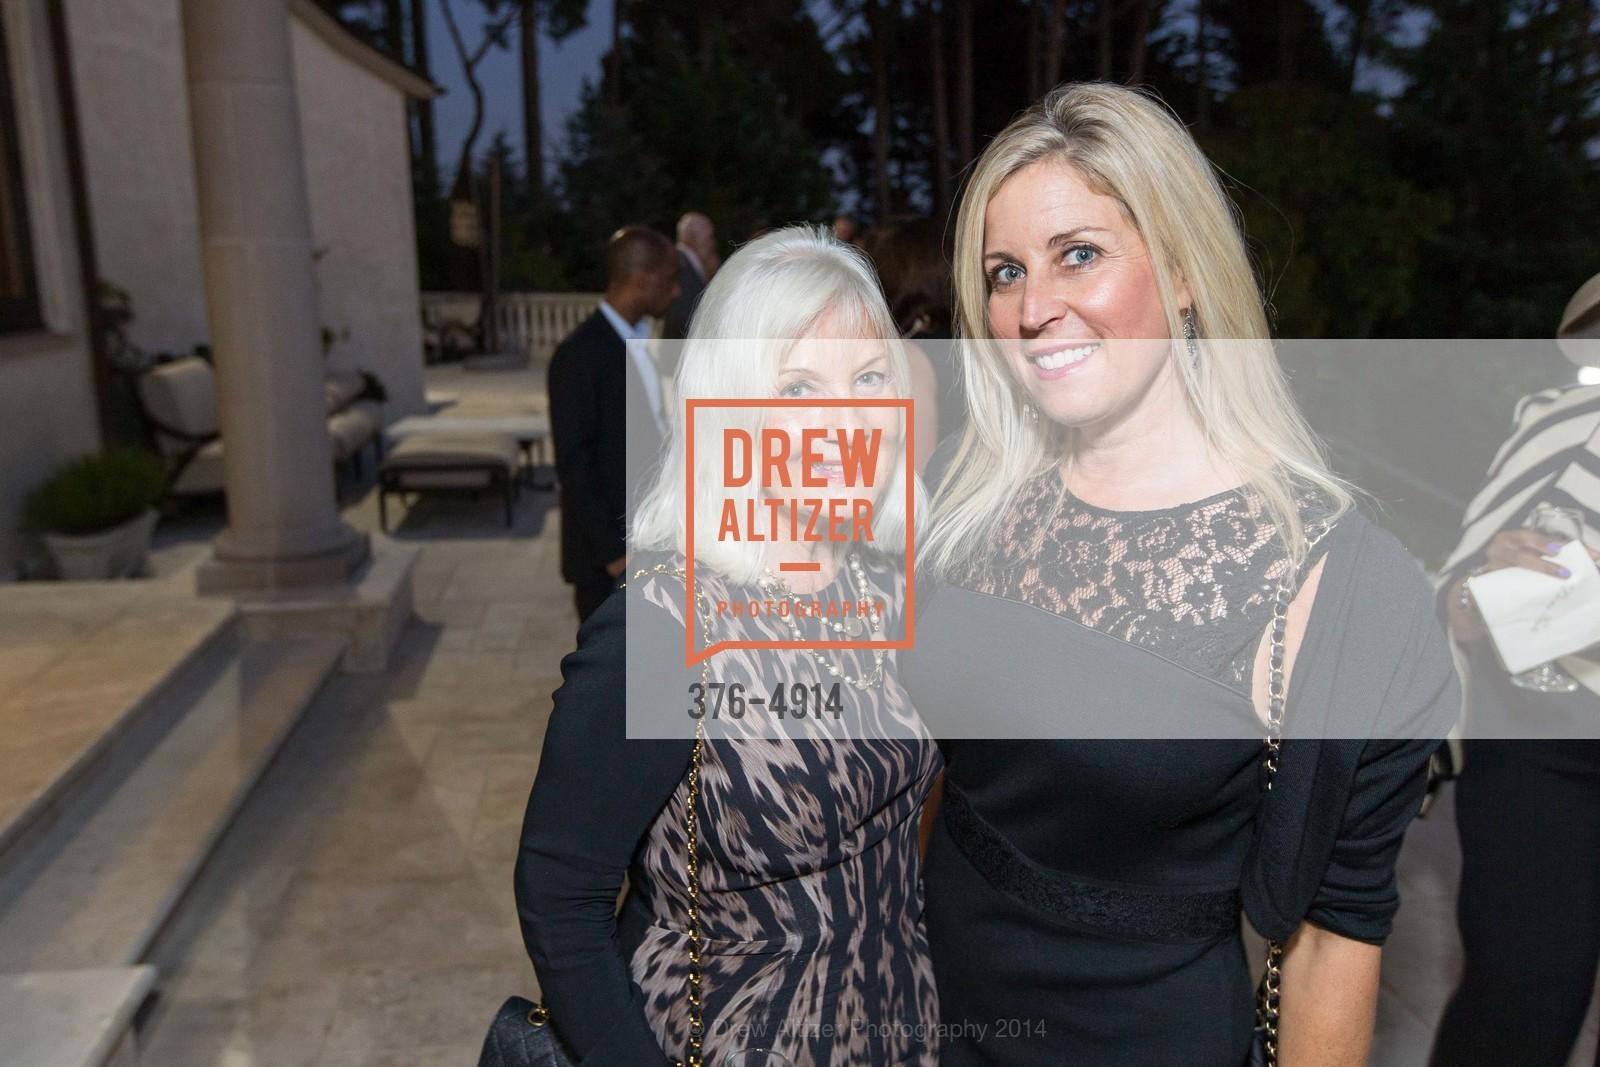 Arlene Inch, Jane Inch, Photo #376-4914